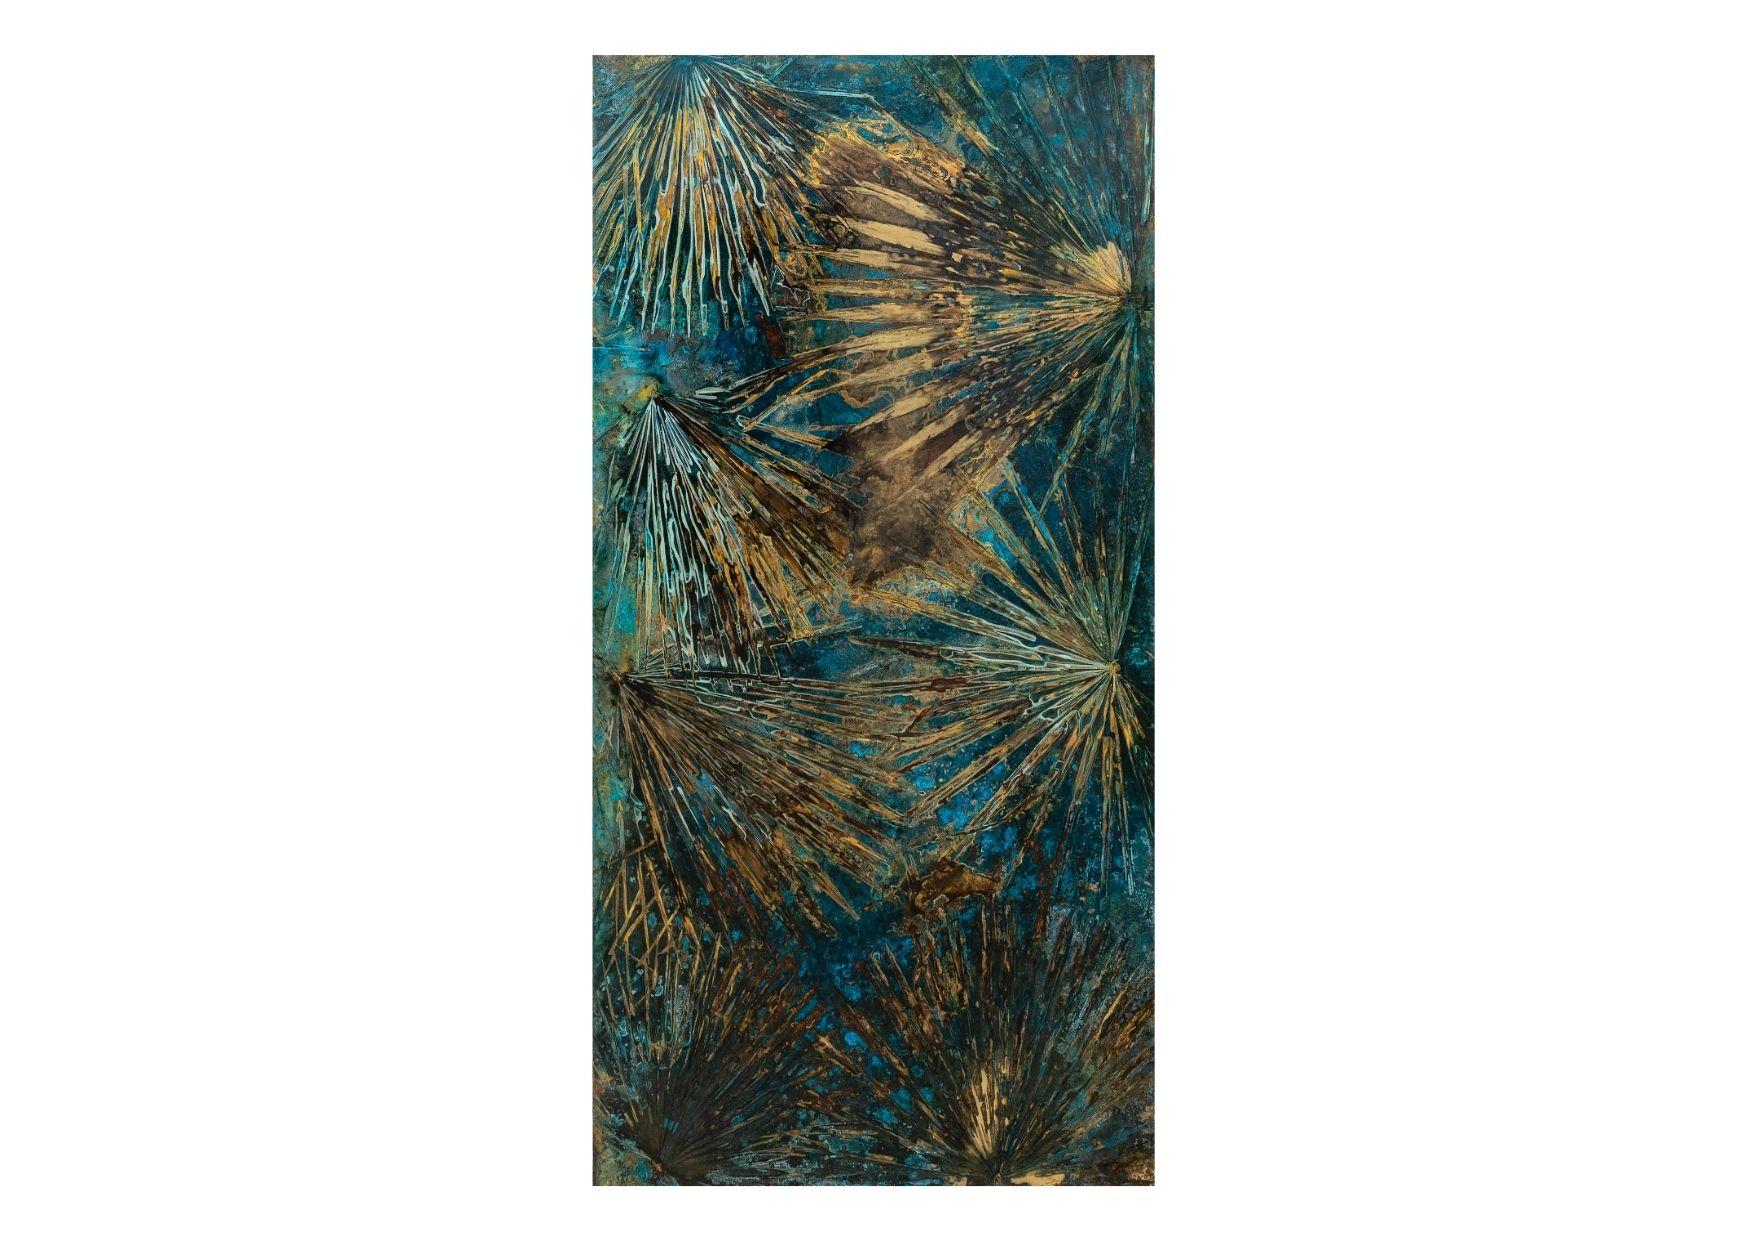 """Brahea Edulis #2"" 2020, ossidazione su ottone, 200 x 100 cm"